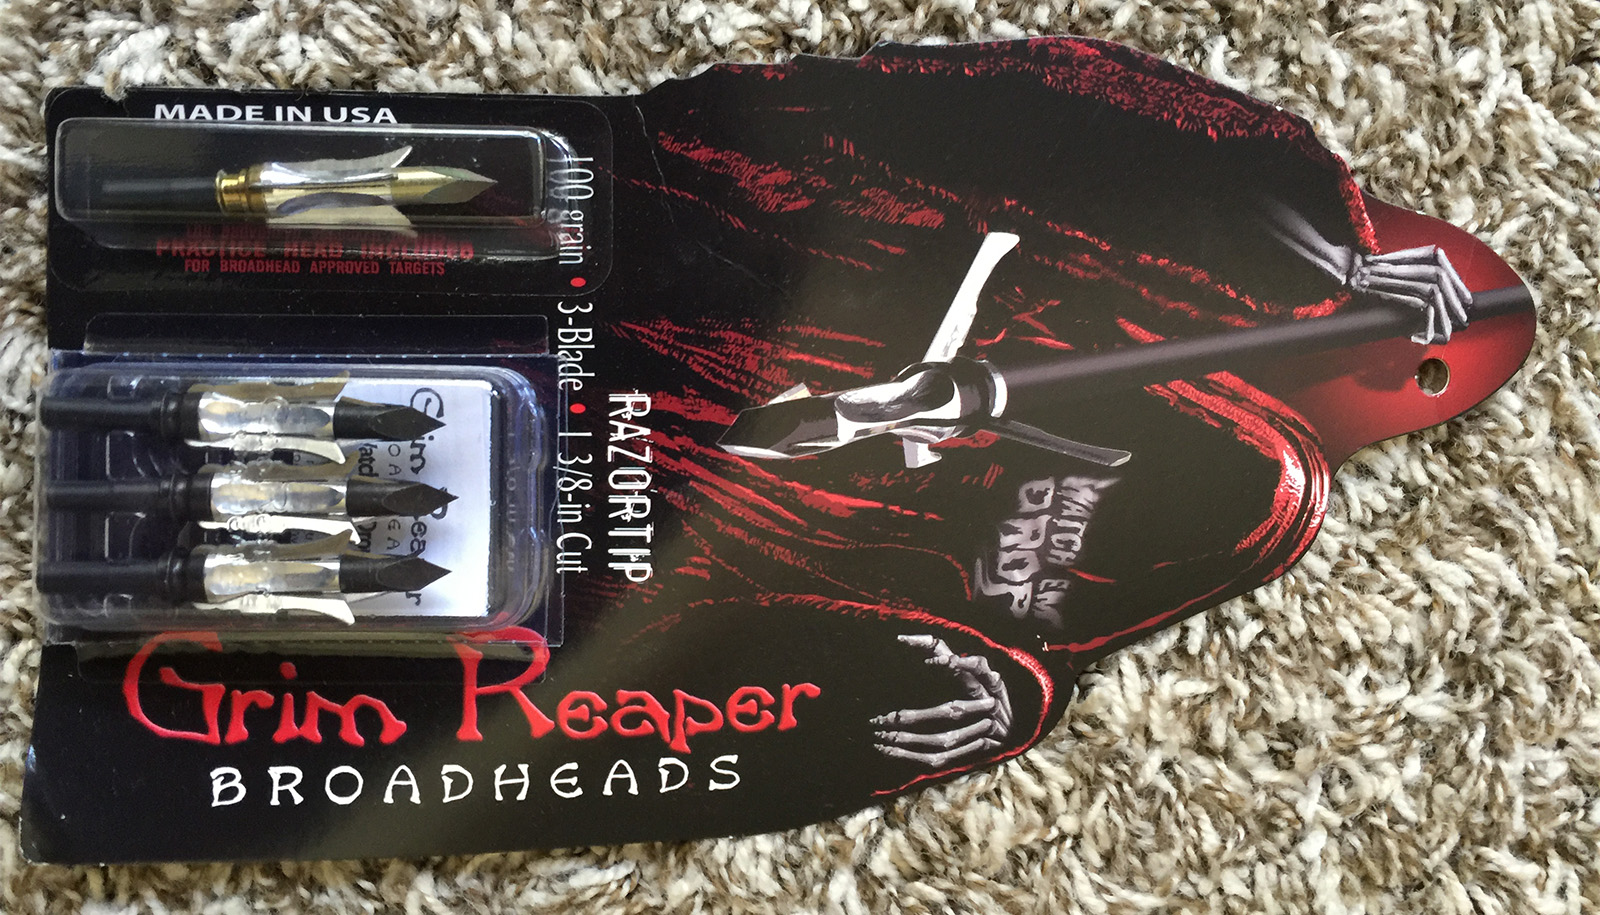 Grim Reaper Broadheads are the choice of veteran bowhunter Rick Philippi